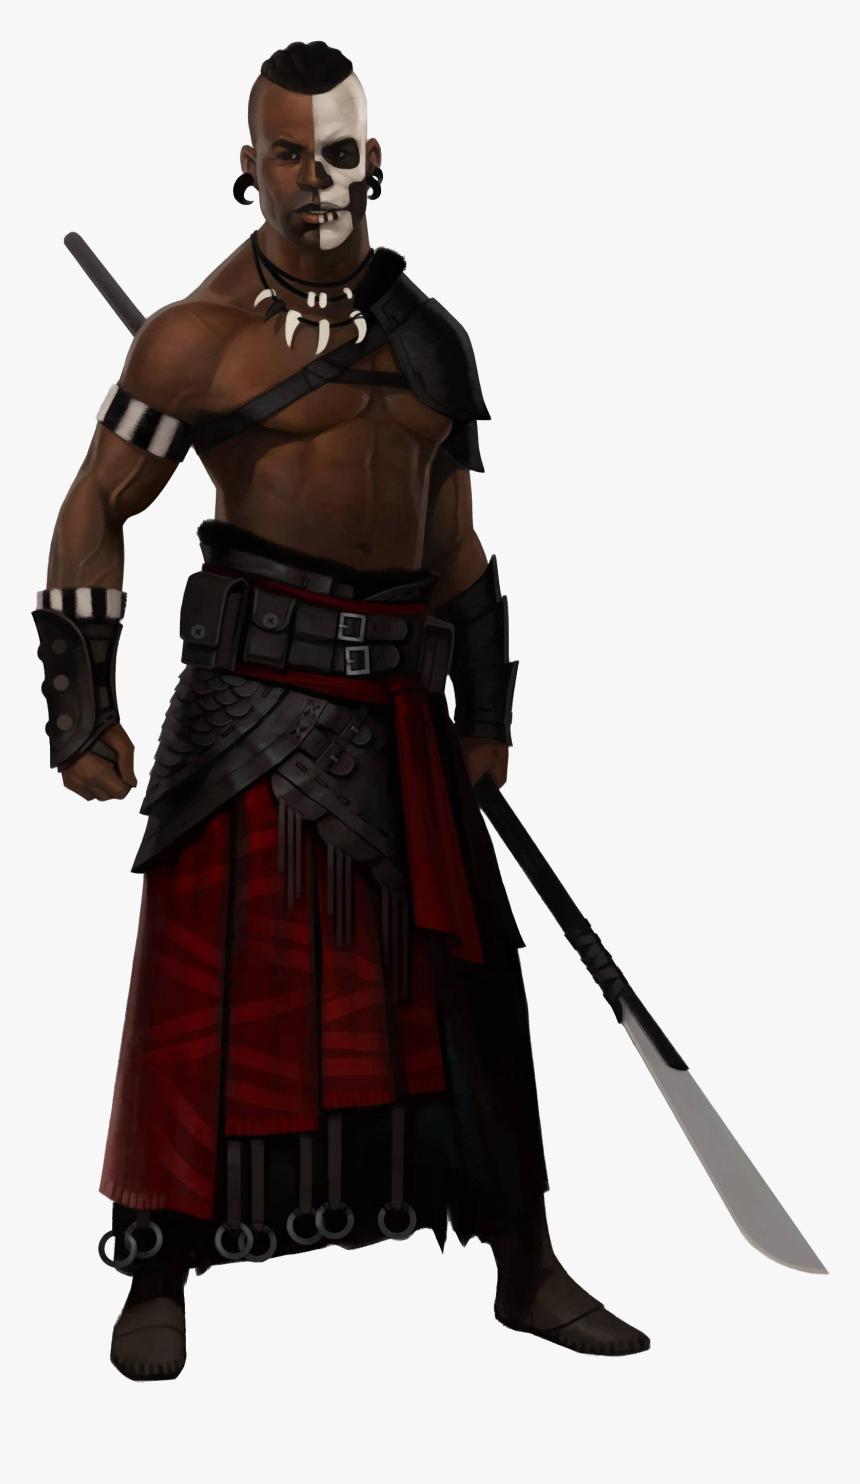 Assassin S Creed Liberation Concept Art Hd Png Download Kindpng